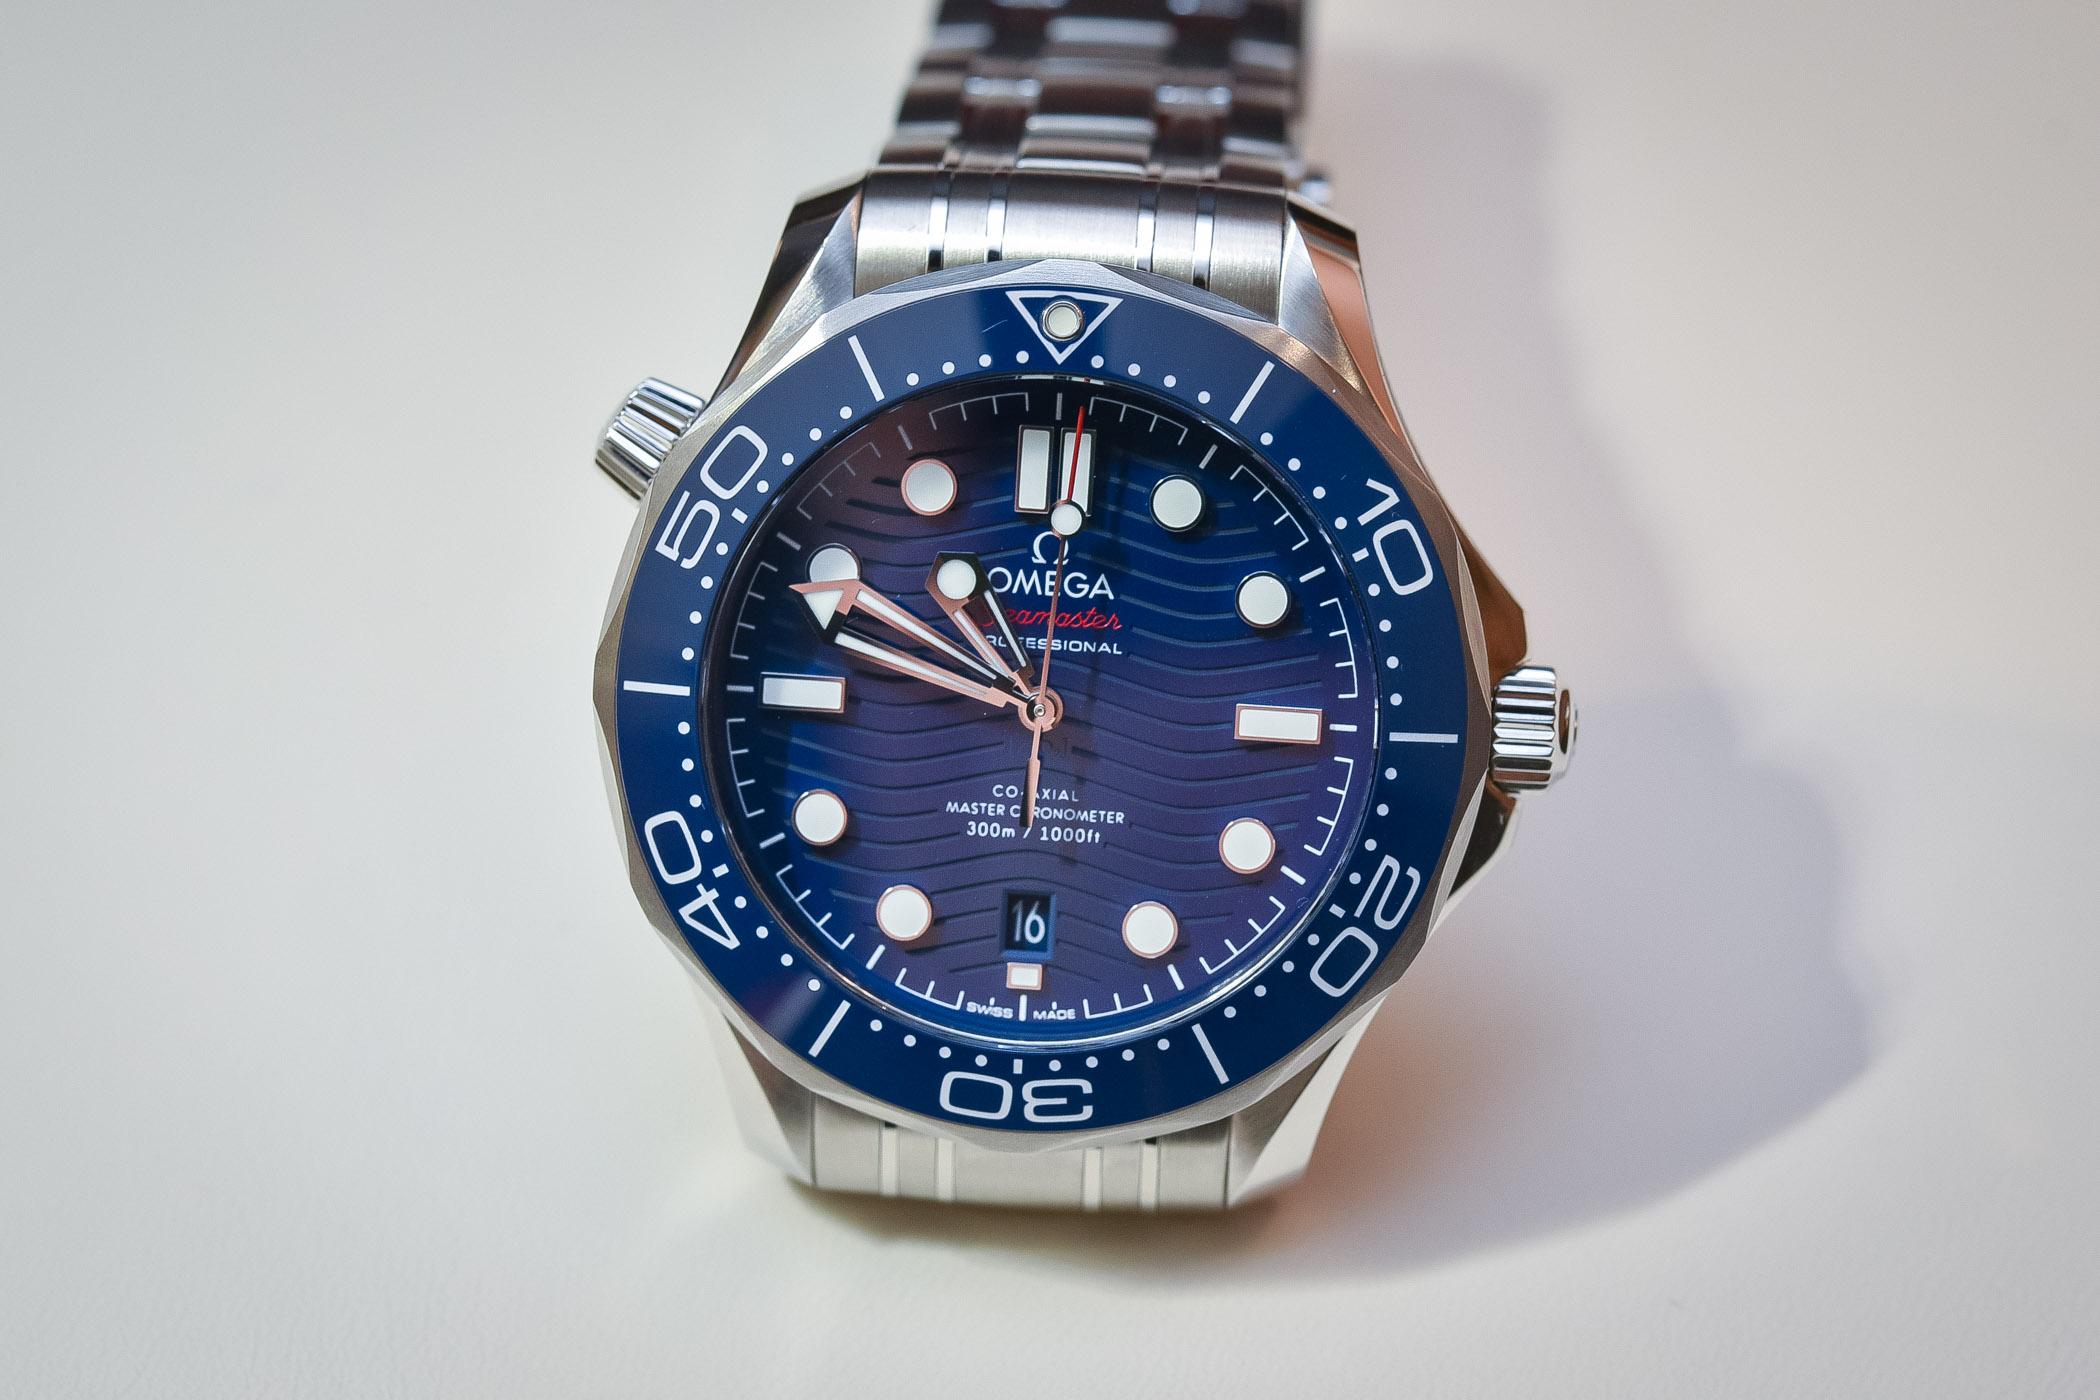 Hands on omega seamaster diver 300m master chronometer - Omega dive watch ...